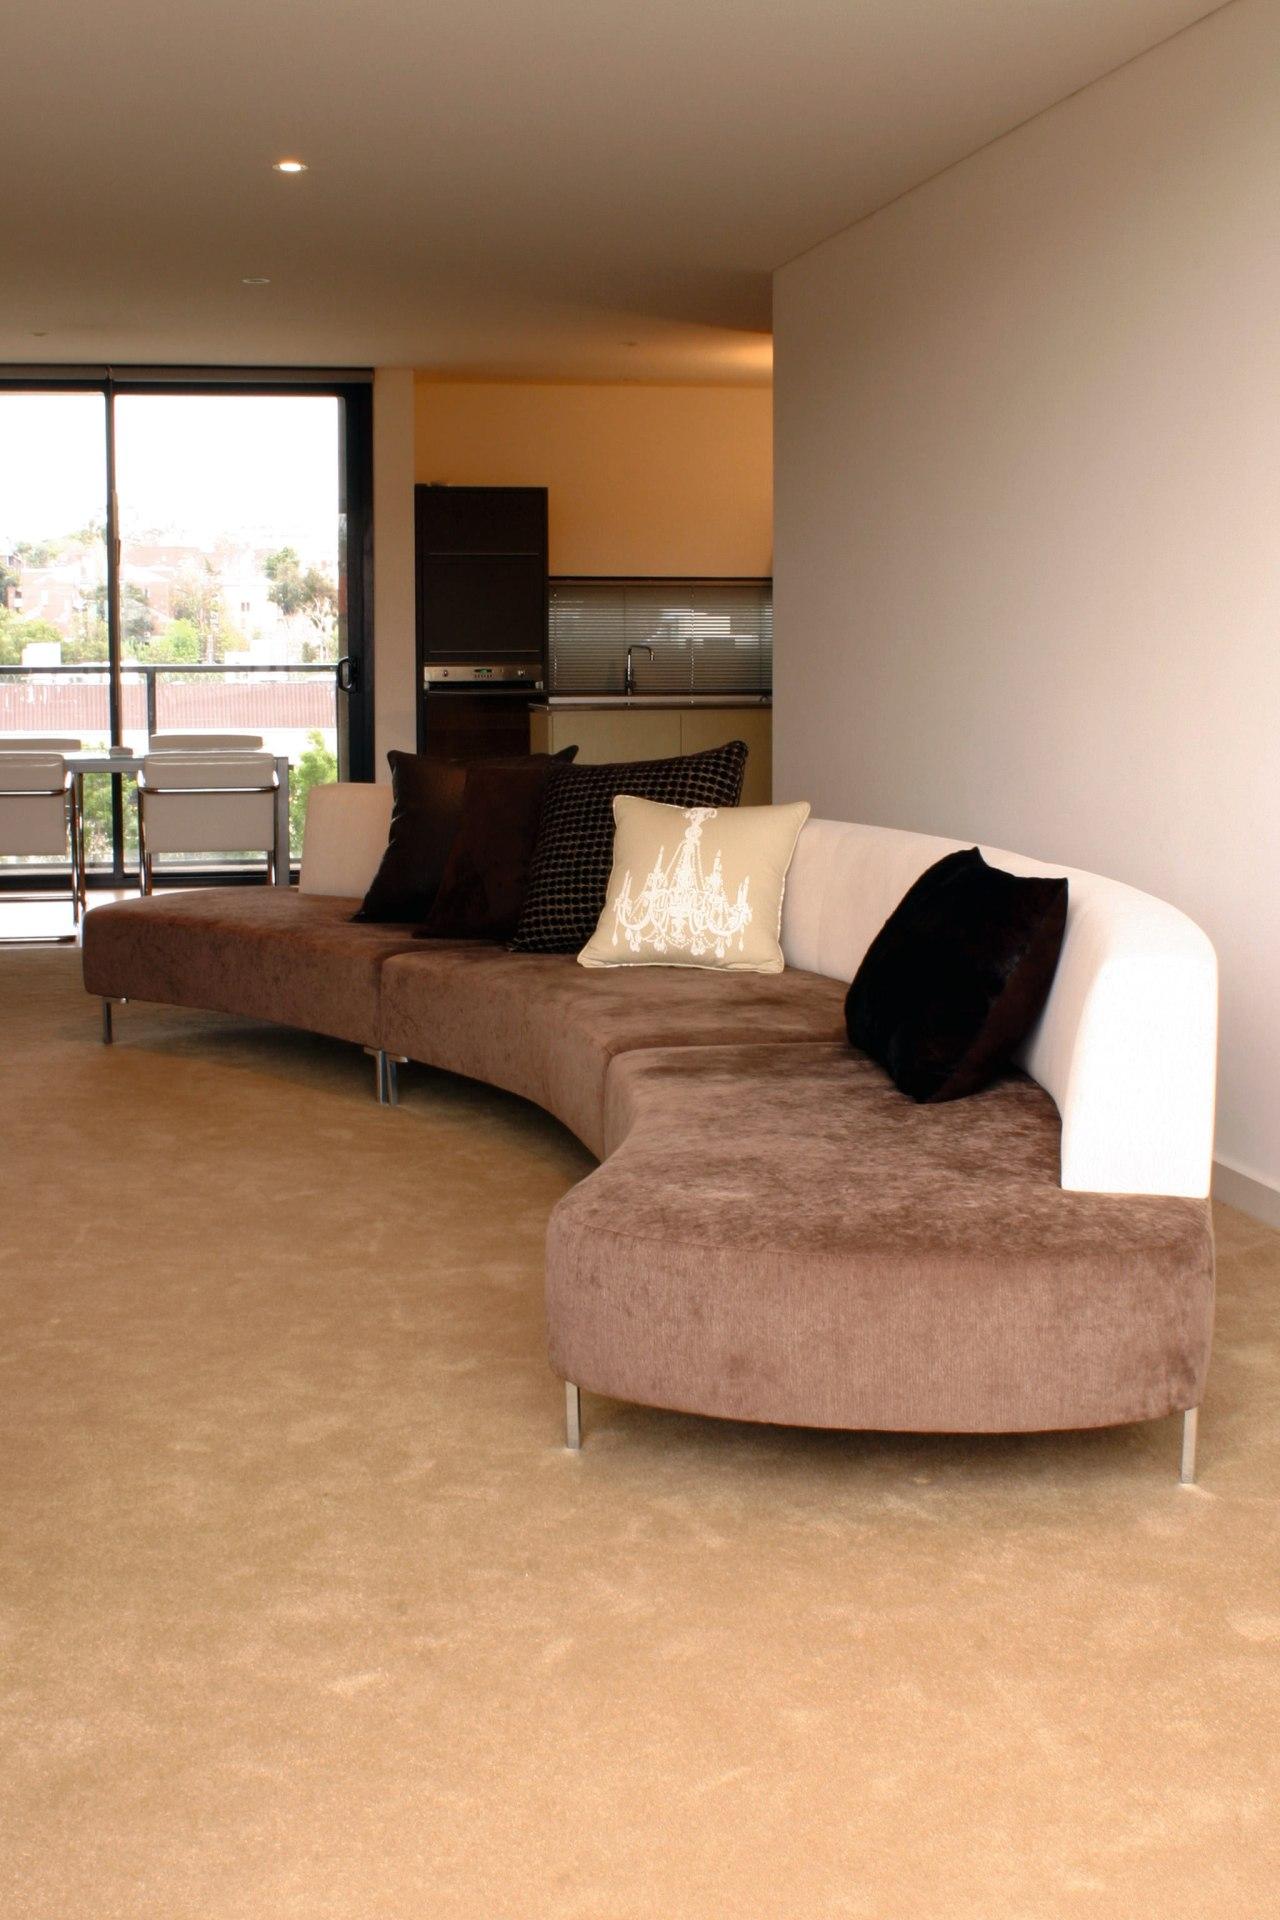 Interior view of sitting area angle, couch, floor, flooring, furniture, hardwood, home, interior design, laminate flooring, living room, room, table, wall, wood, wood flooring, brown, orange